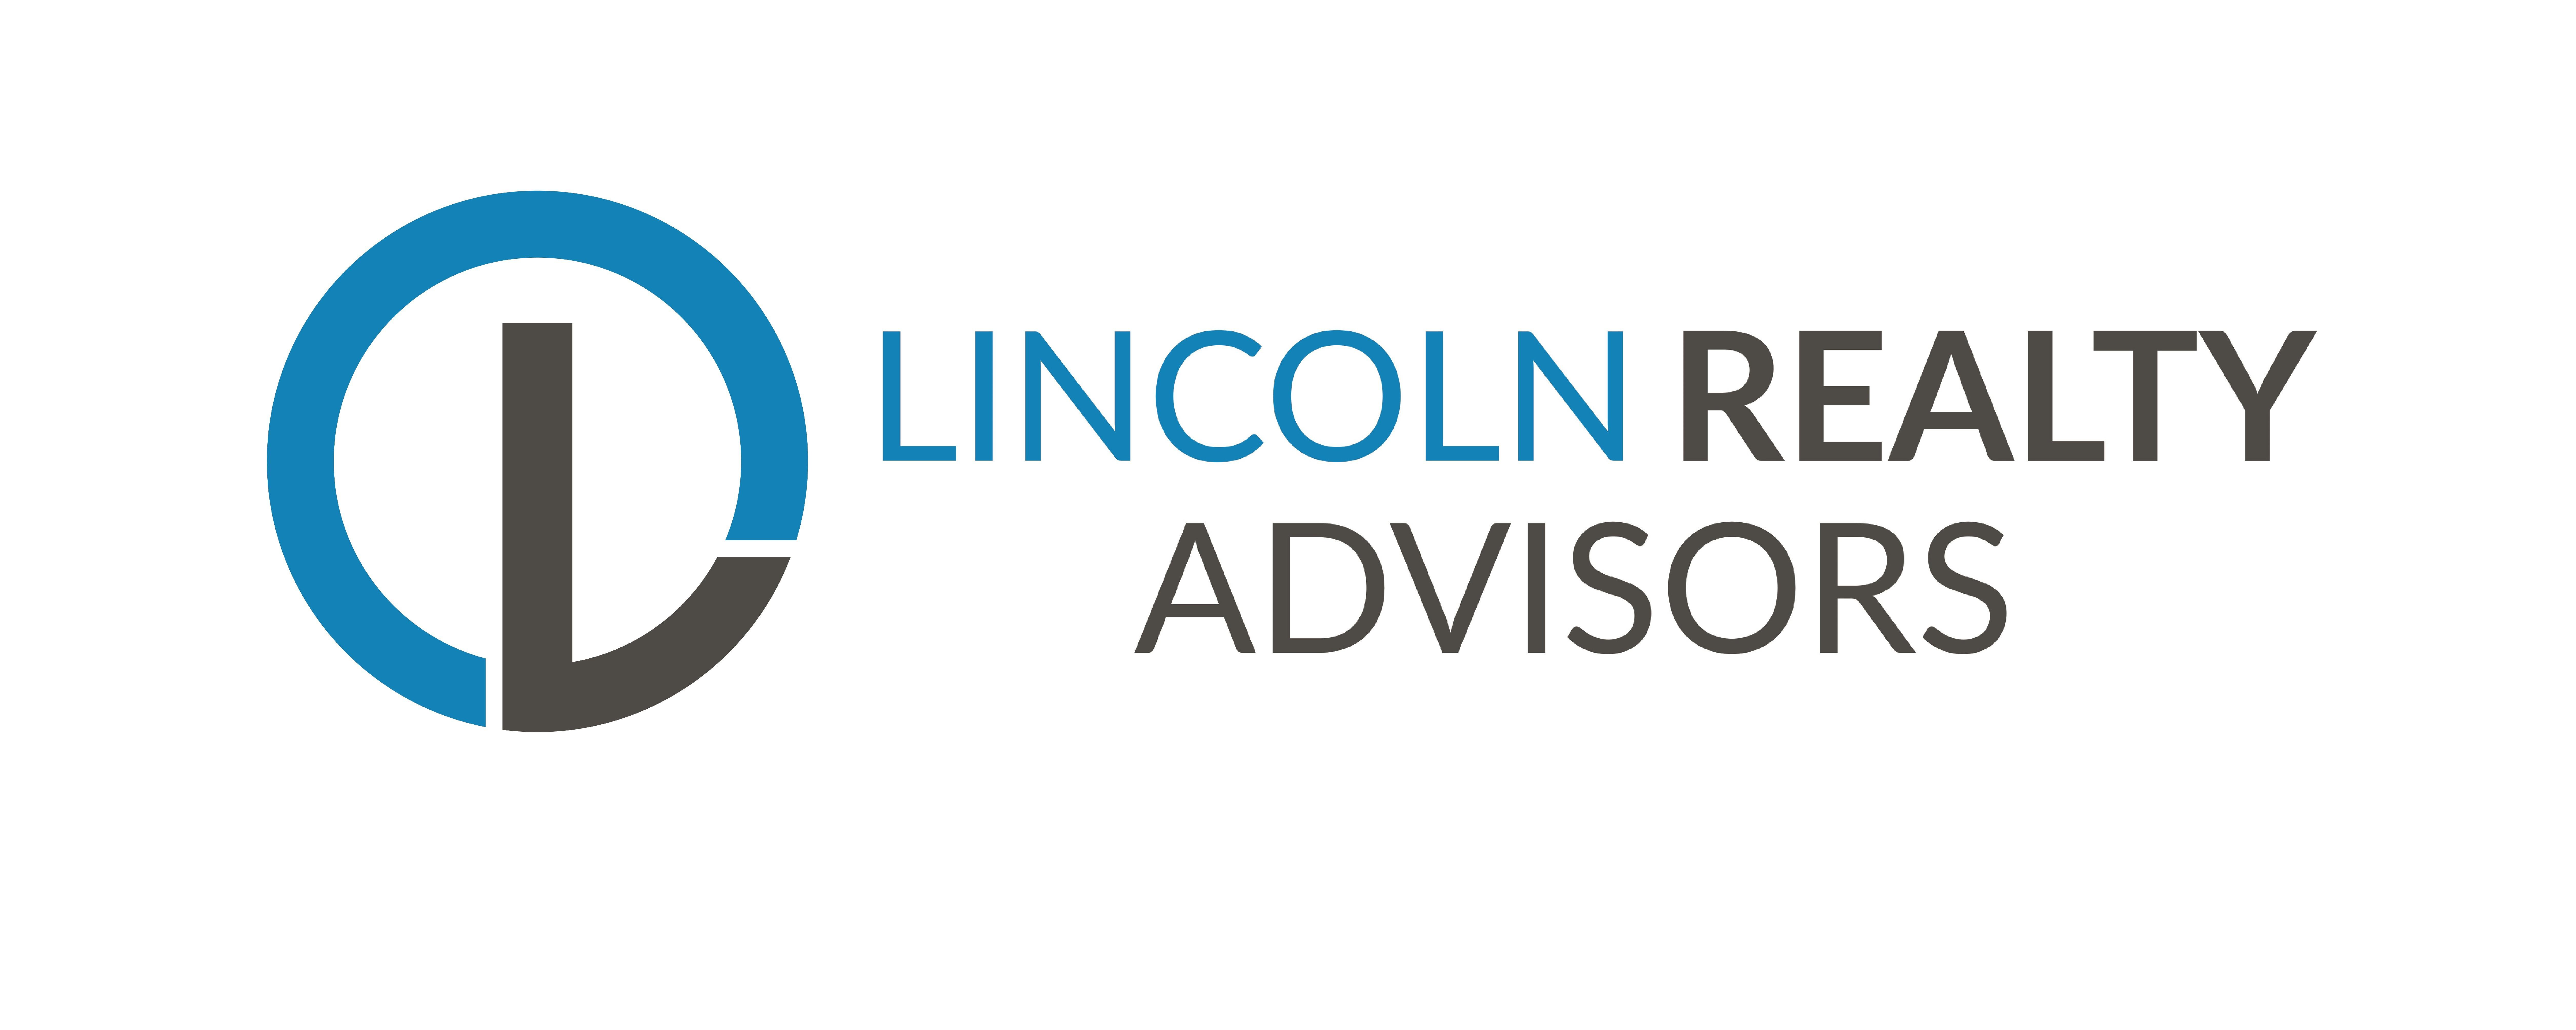 Lincoln Realty Advisors